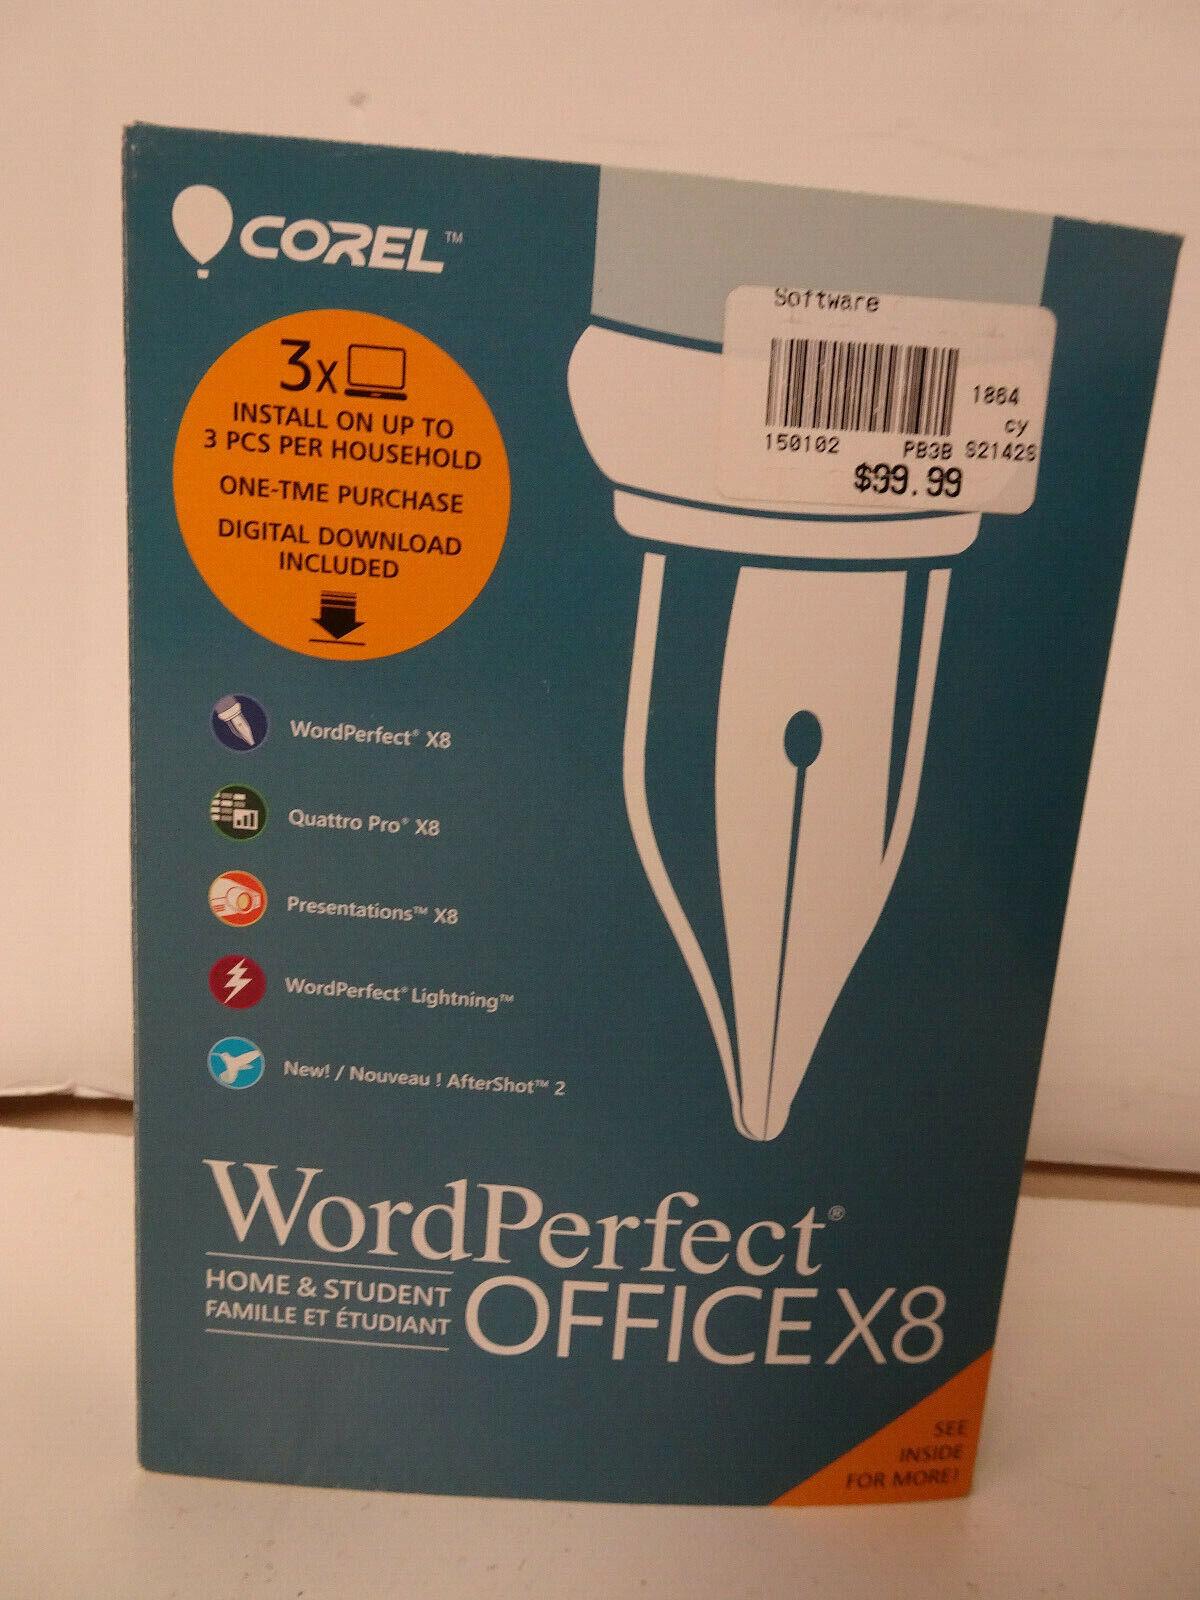 NIB Corel WordPerfect Office X8 Home & Student Edition Software 3X PC's